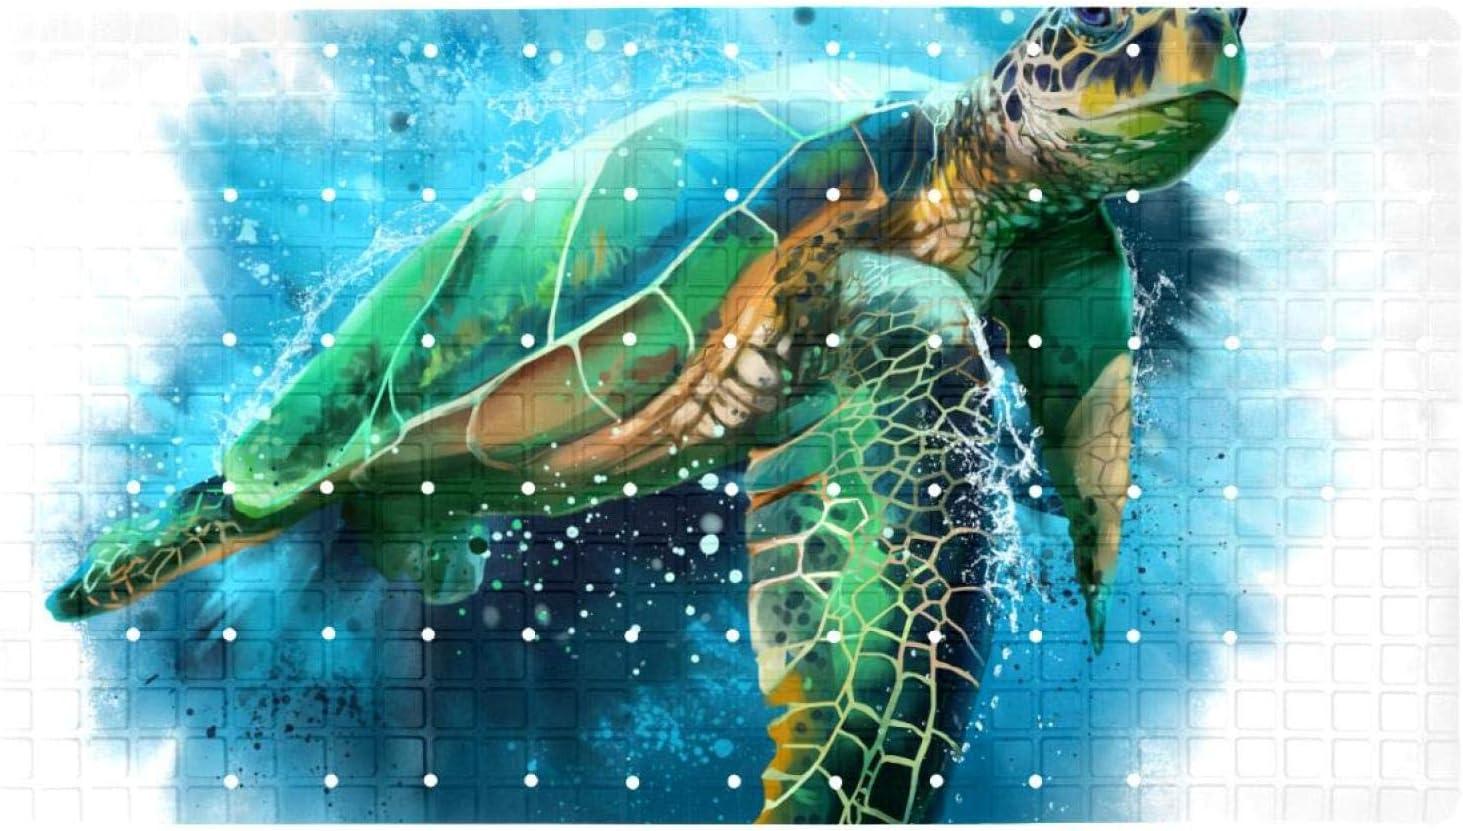 Bath Tub Shower Mat 15.7x27.9 inches Watercolor Turtle Sea Max 50% OFF Ranking TOP17 P Big